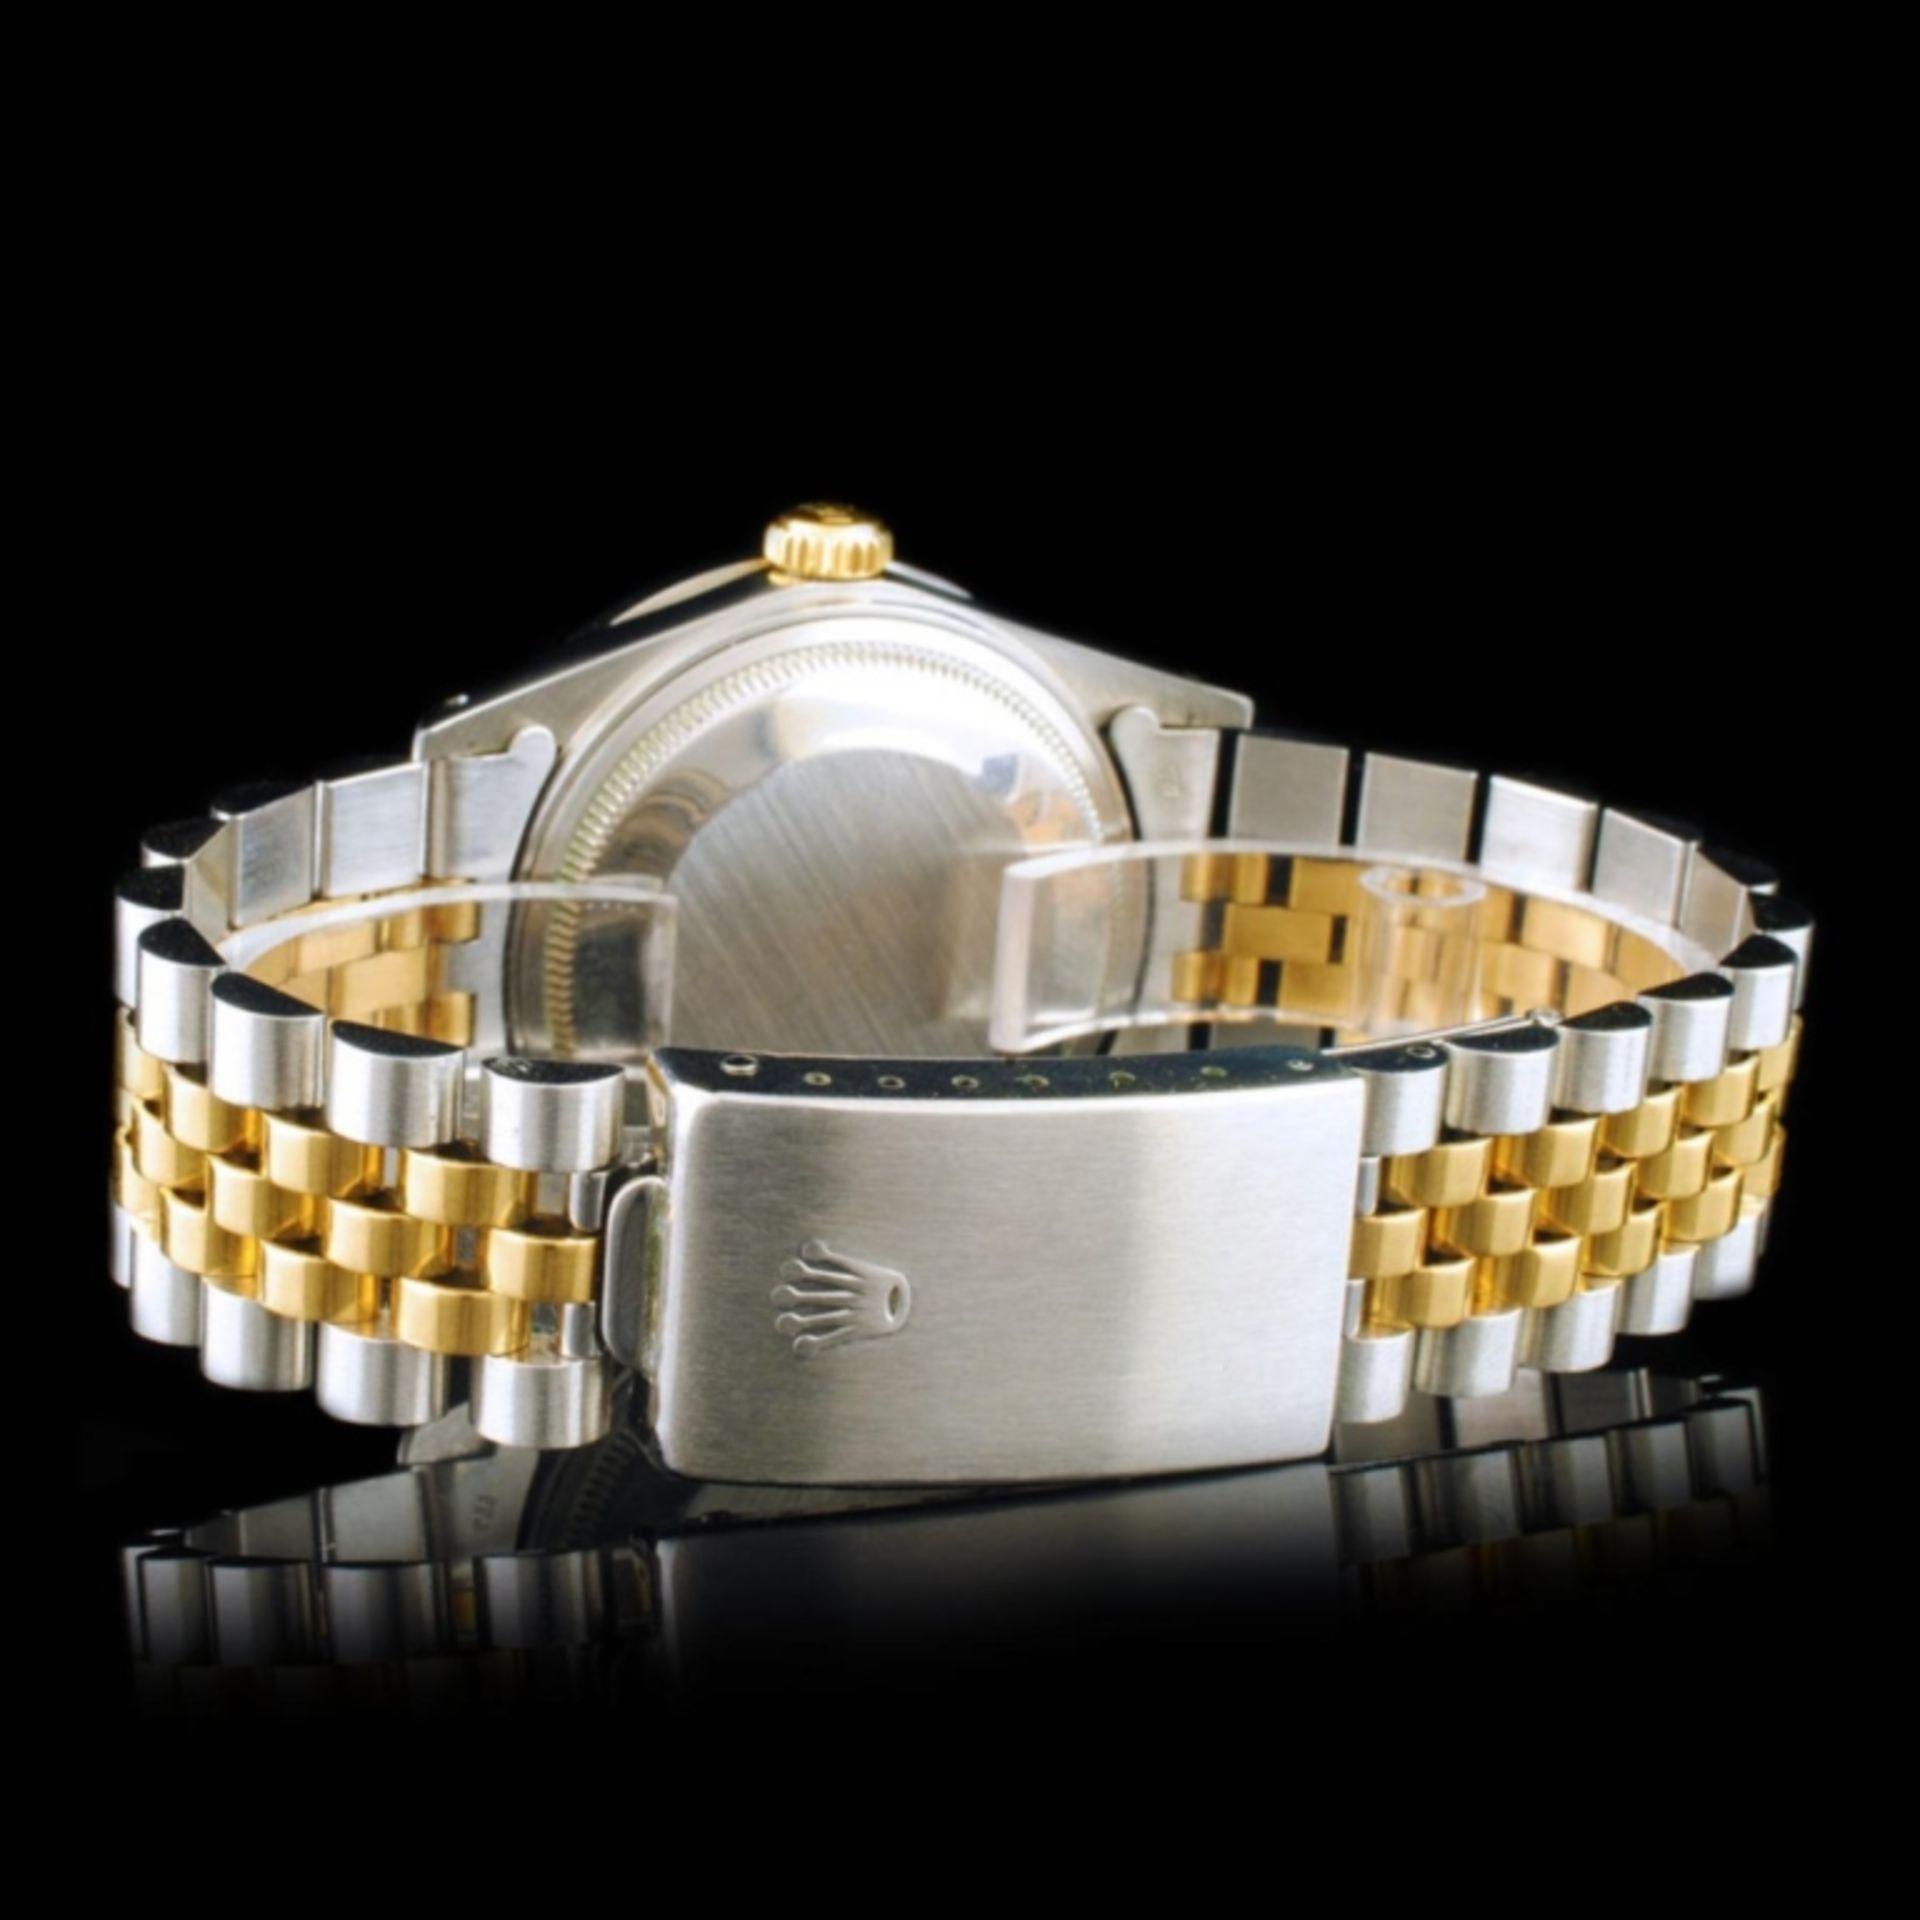 Rolex DateJust YG/SS Diamond 36mm Wristwatch - Image 5 of 6